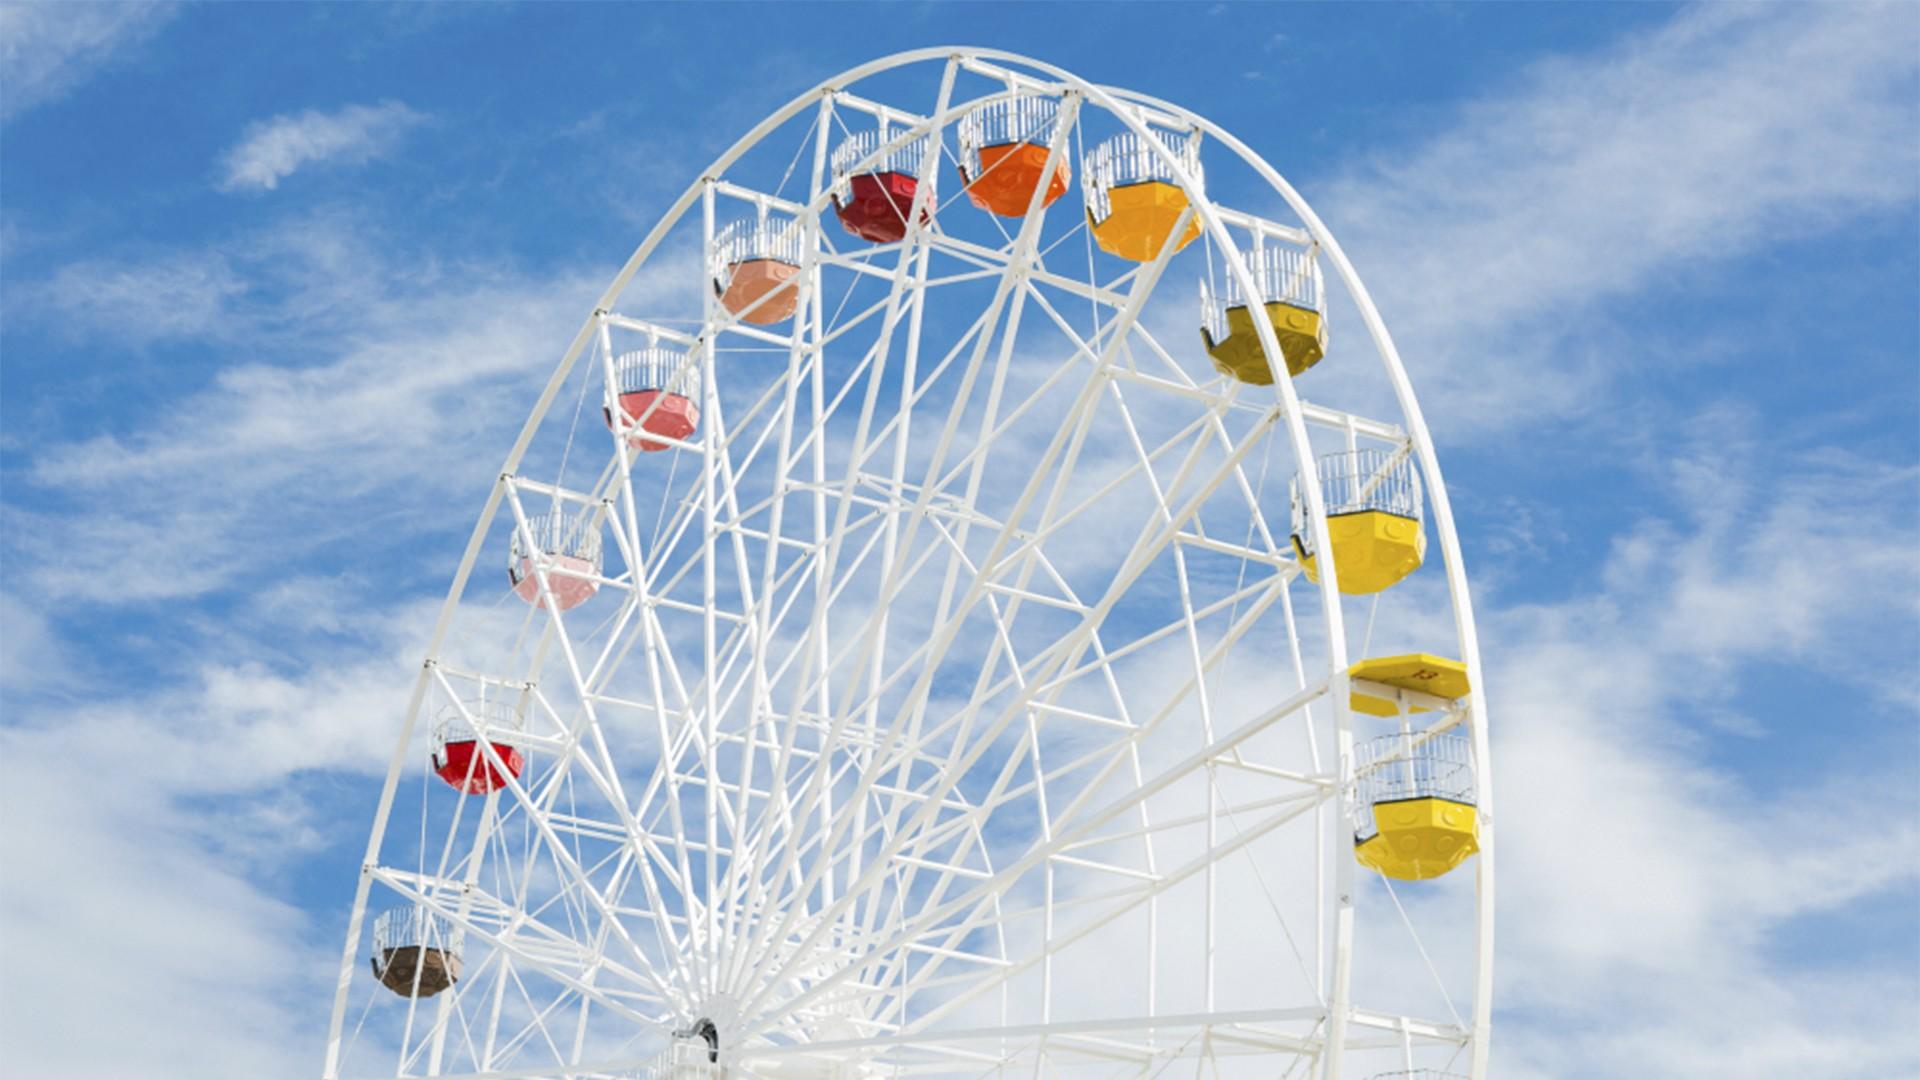 The Big Wheel at Margate's Dreamland